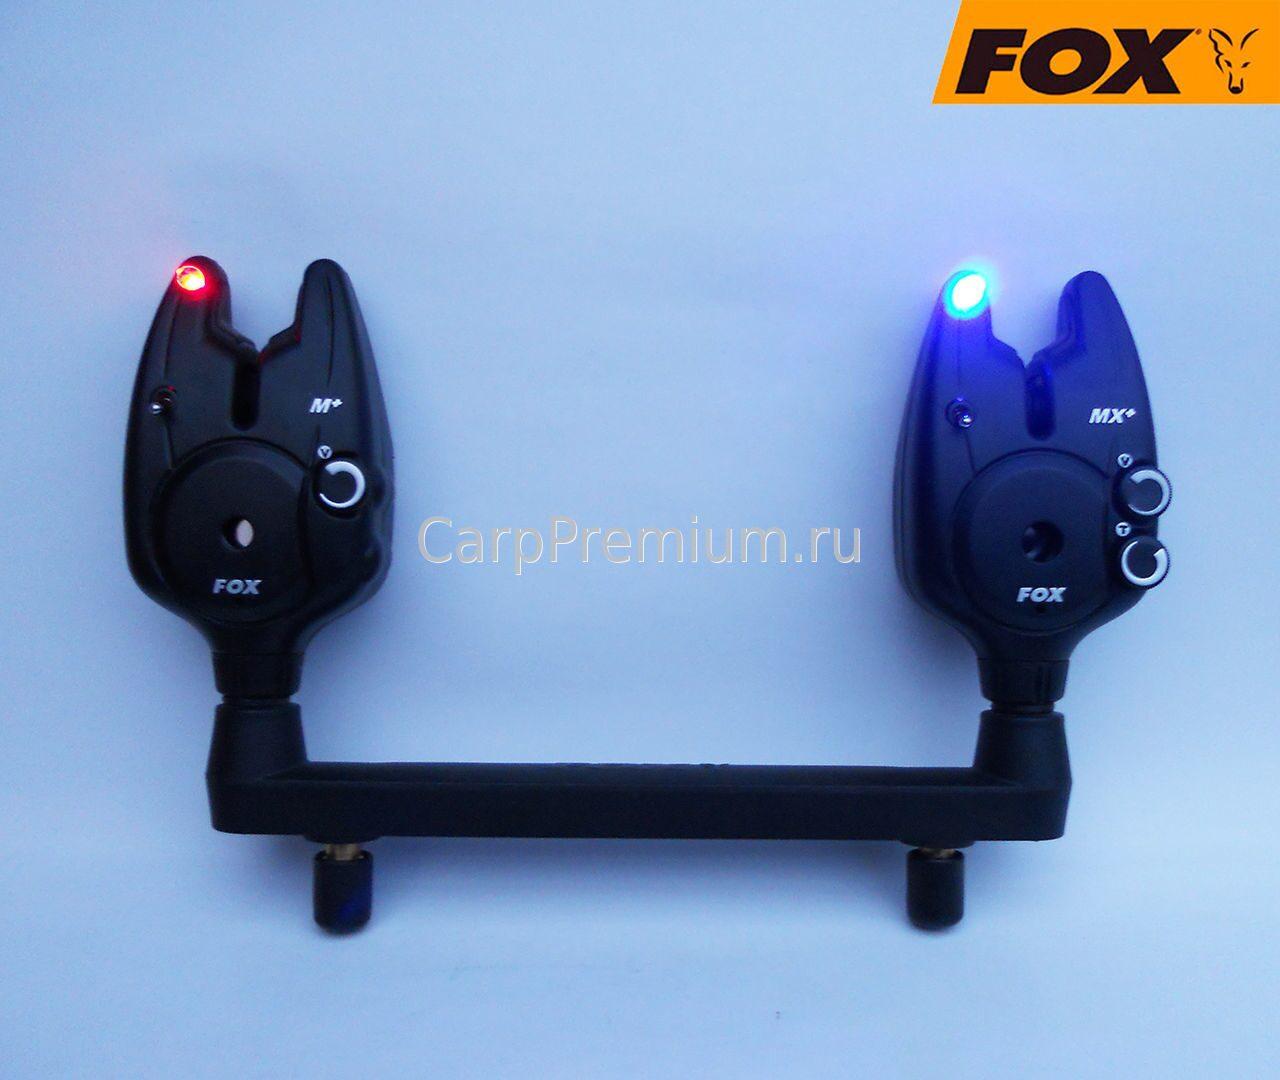 сигнализатор поклевок fox rx